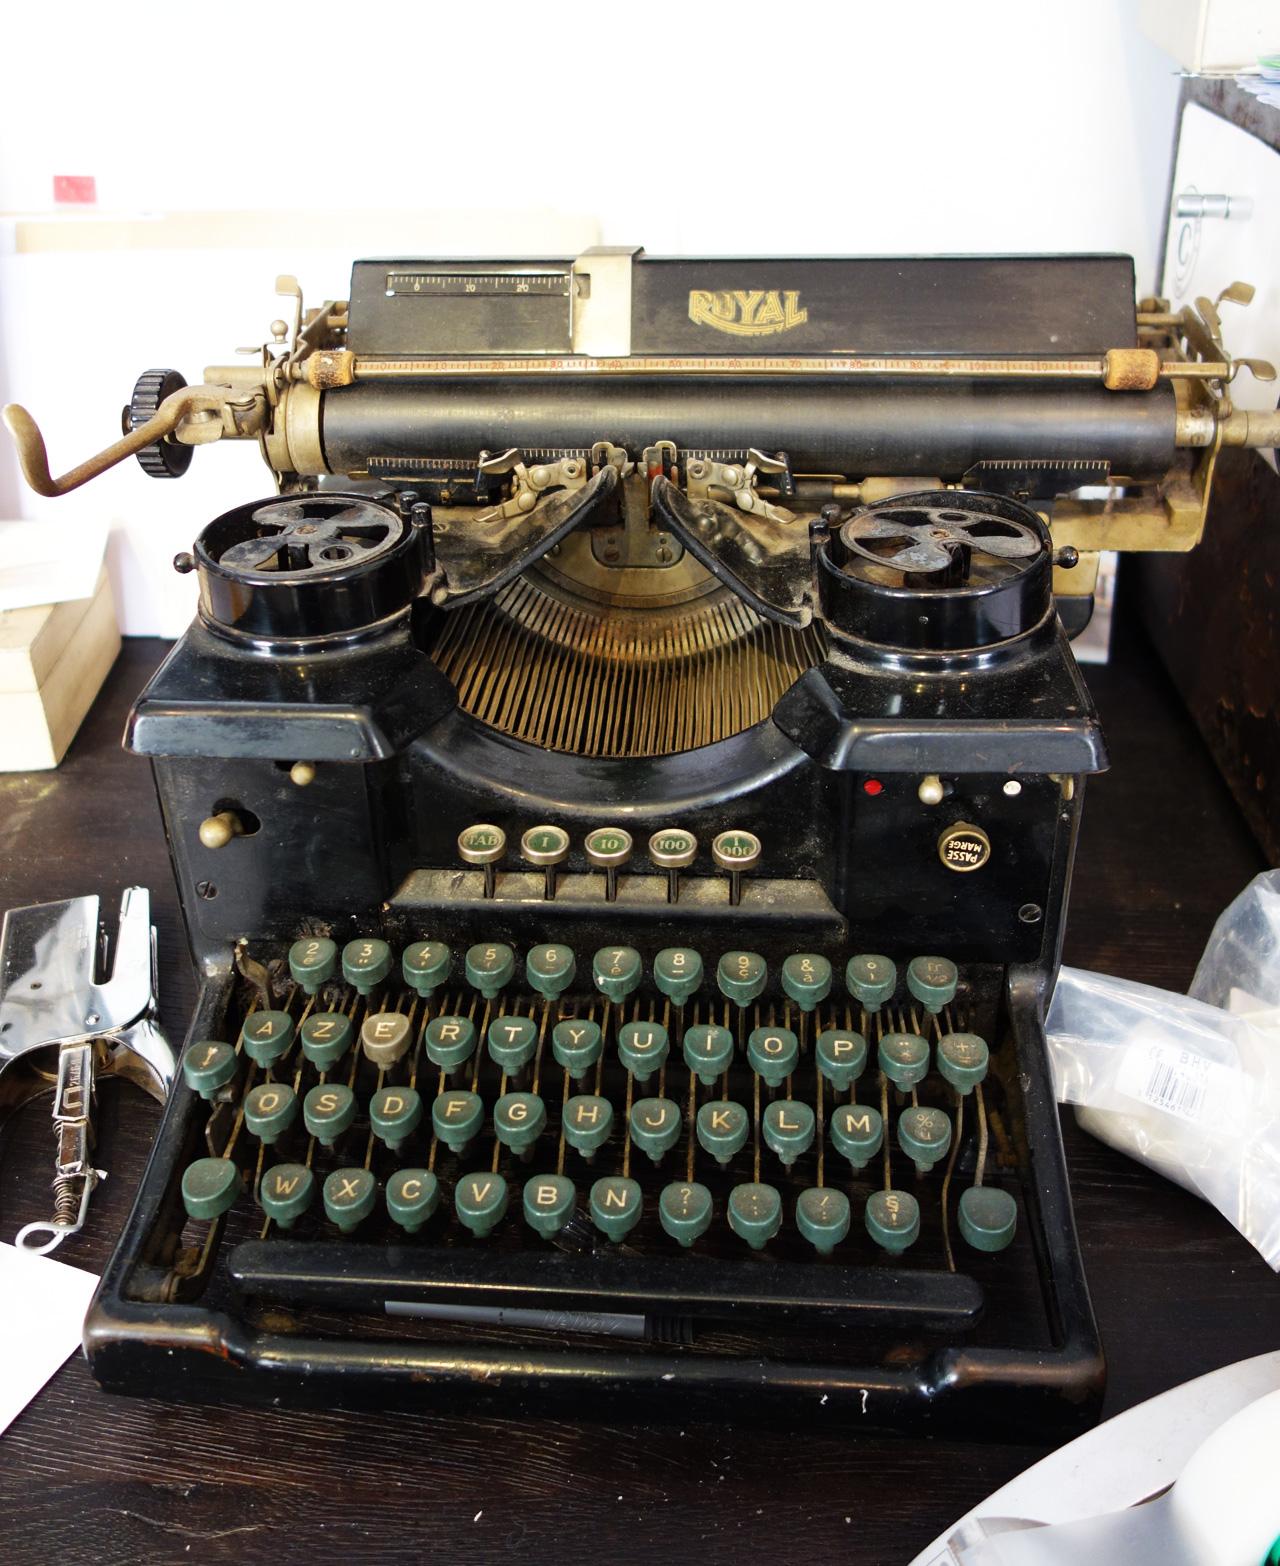 David-Gaillard-Les-Curieuses-deco-bureau-machine-a-ecrire